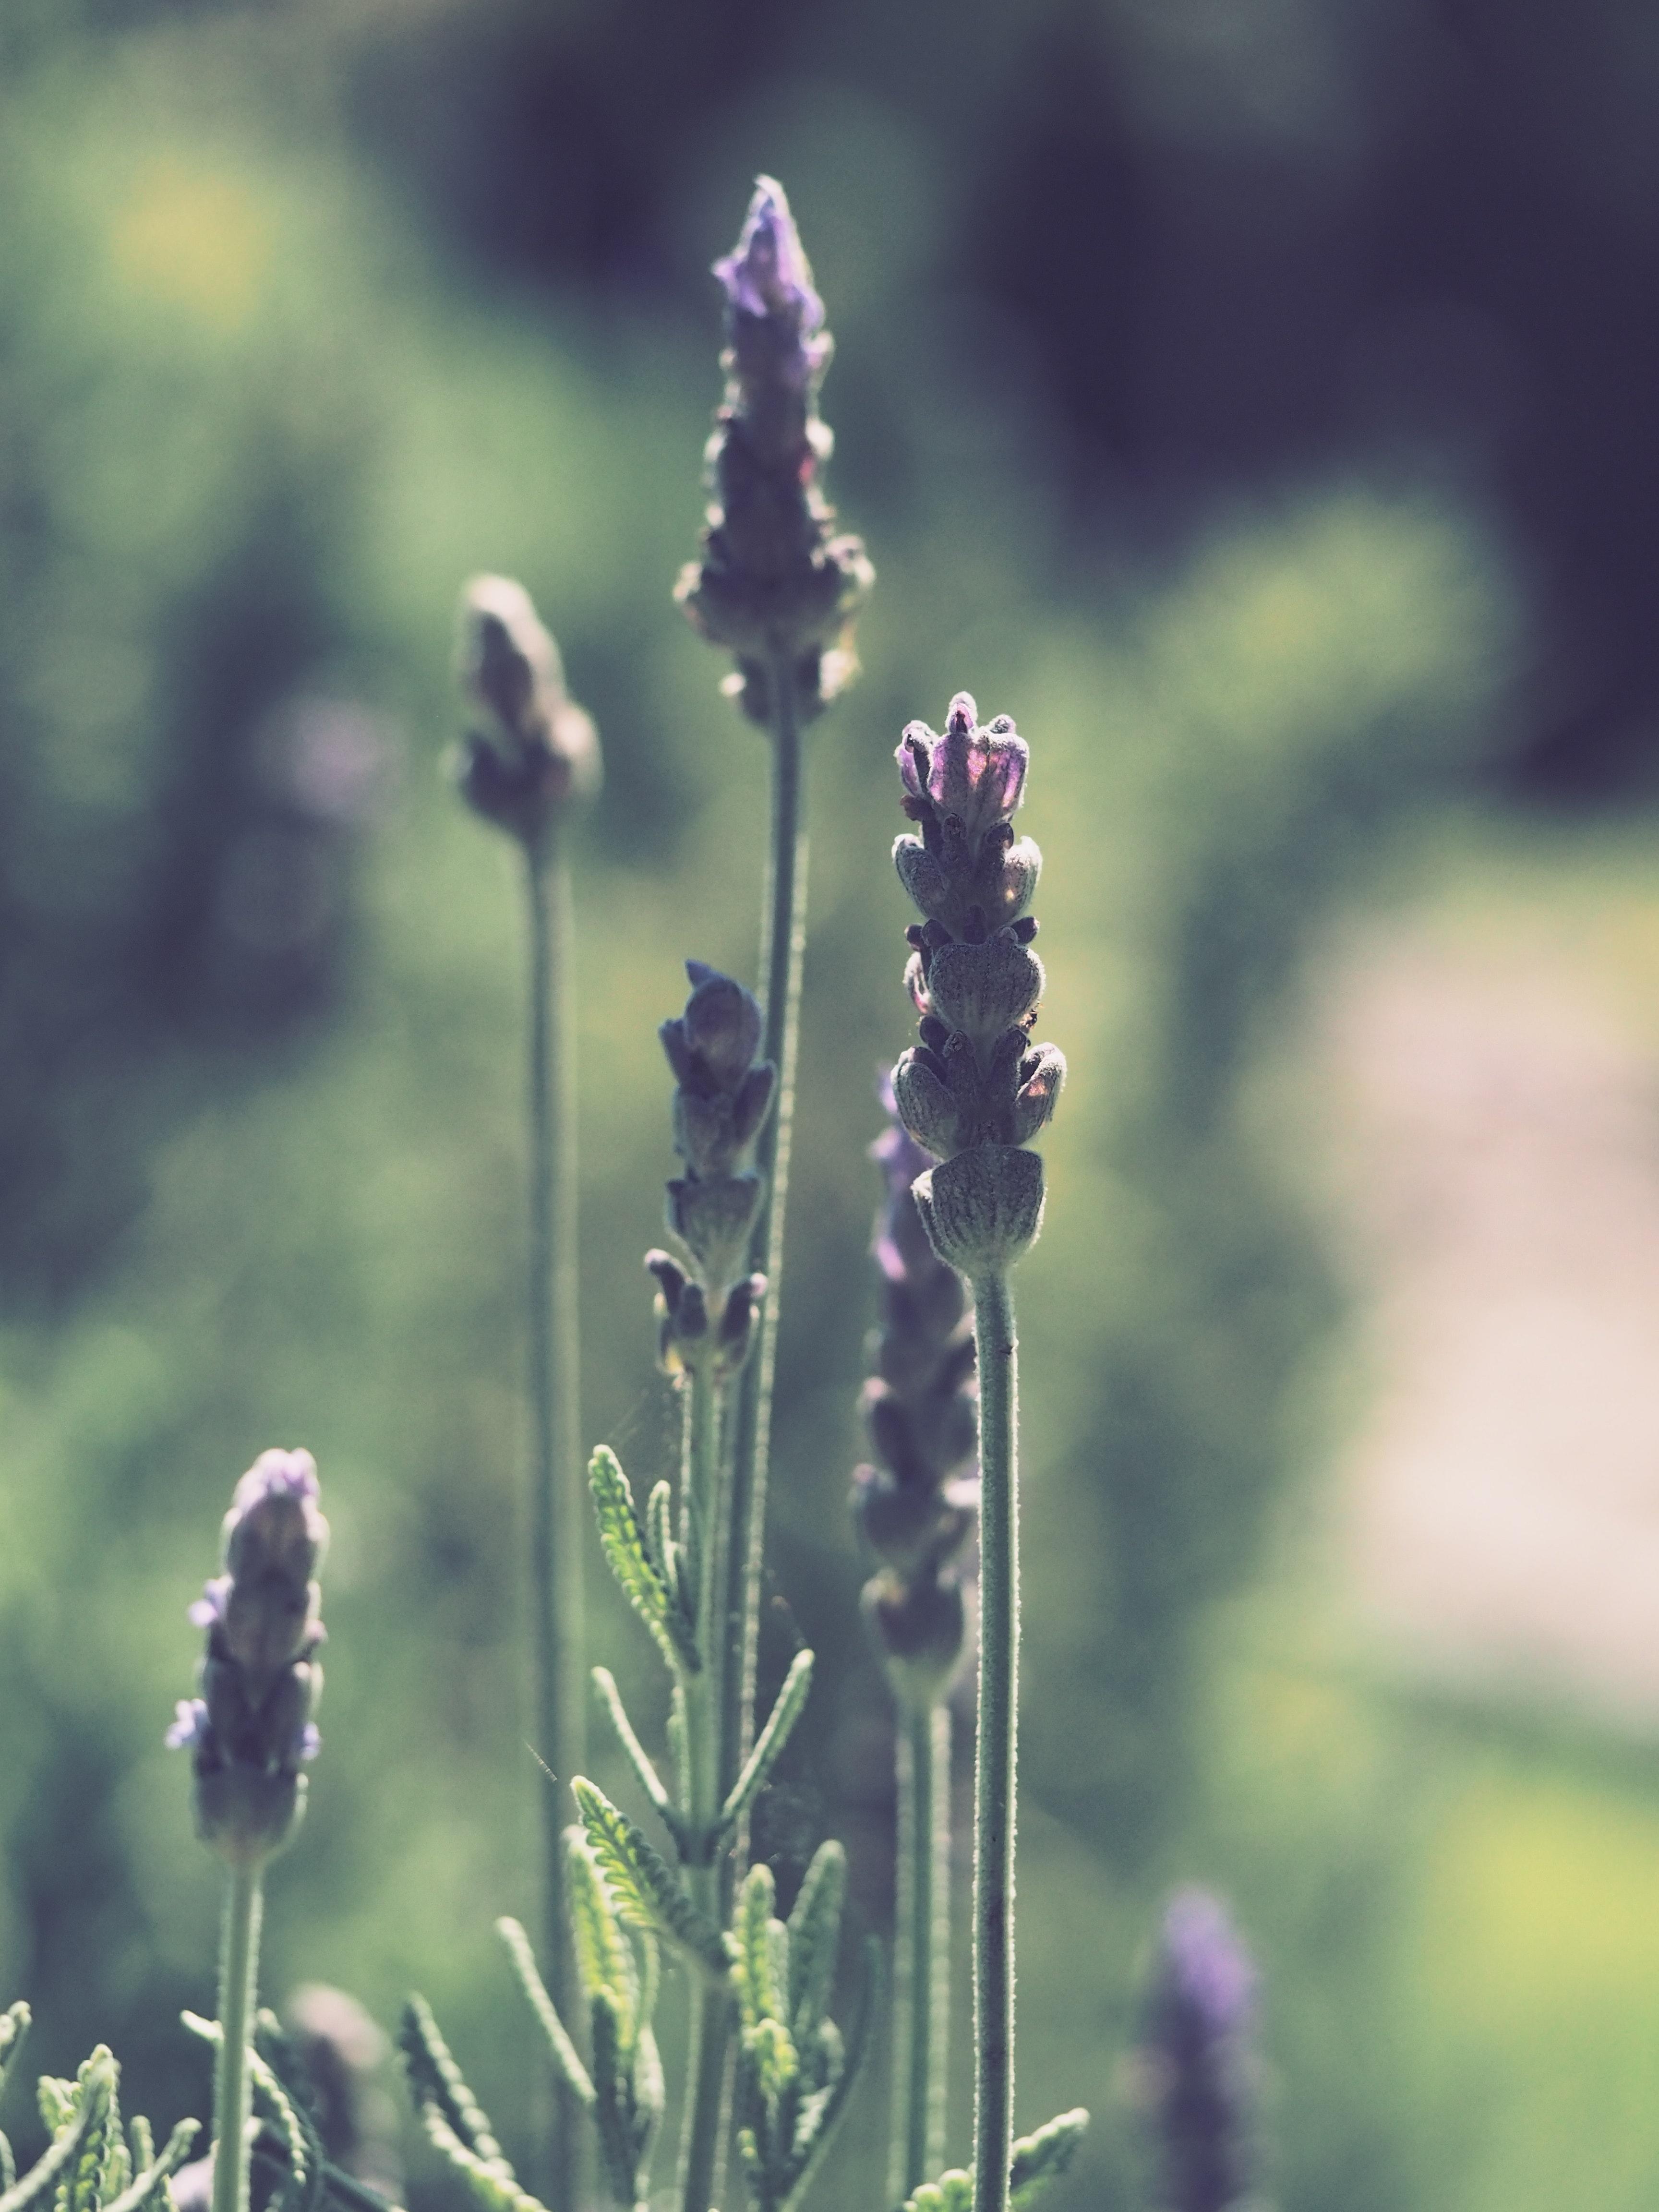 Free photo tilt shift photography of lavender nature nature tilt shift photography of lavender izmirmasajfo